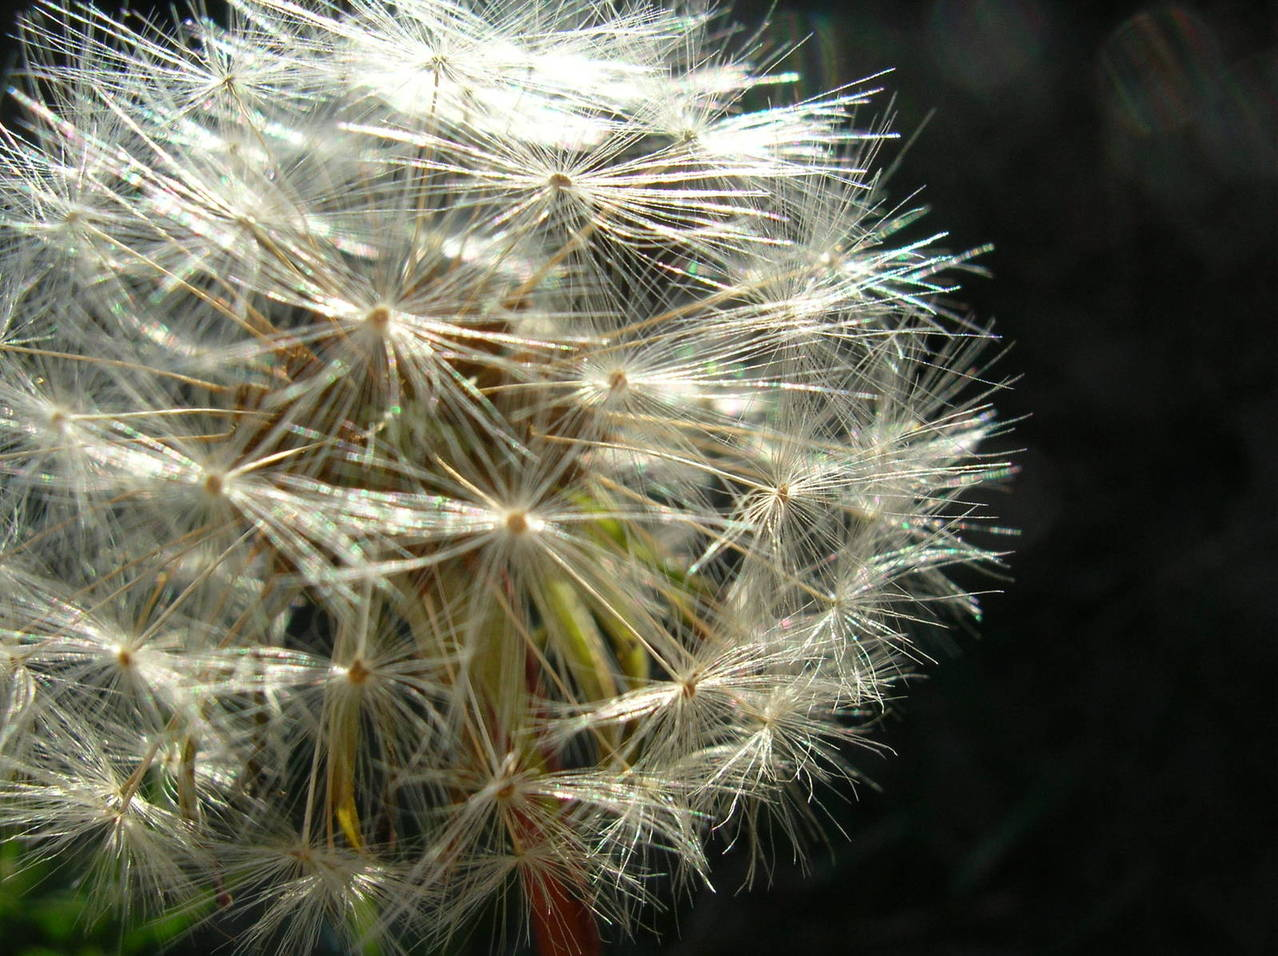 Objawy alergii skórnej